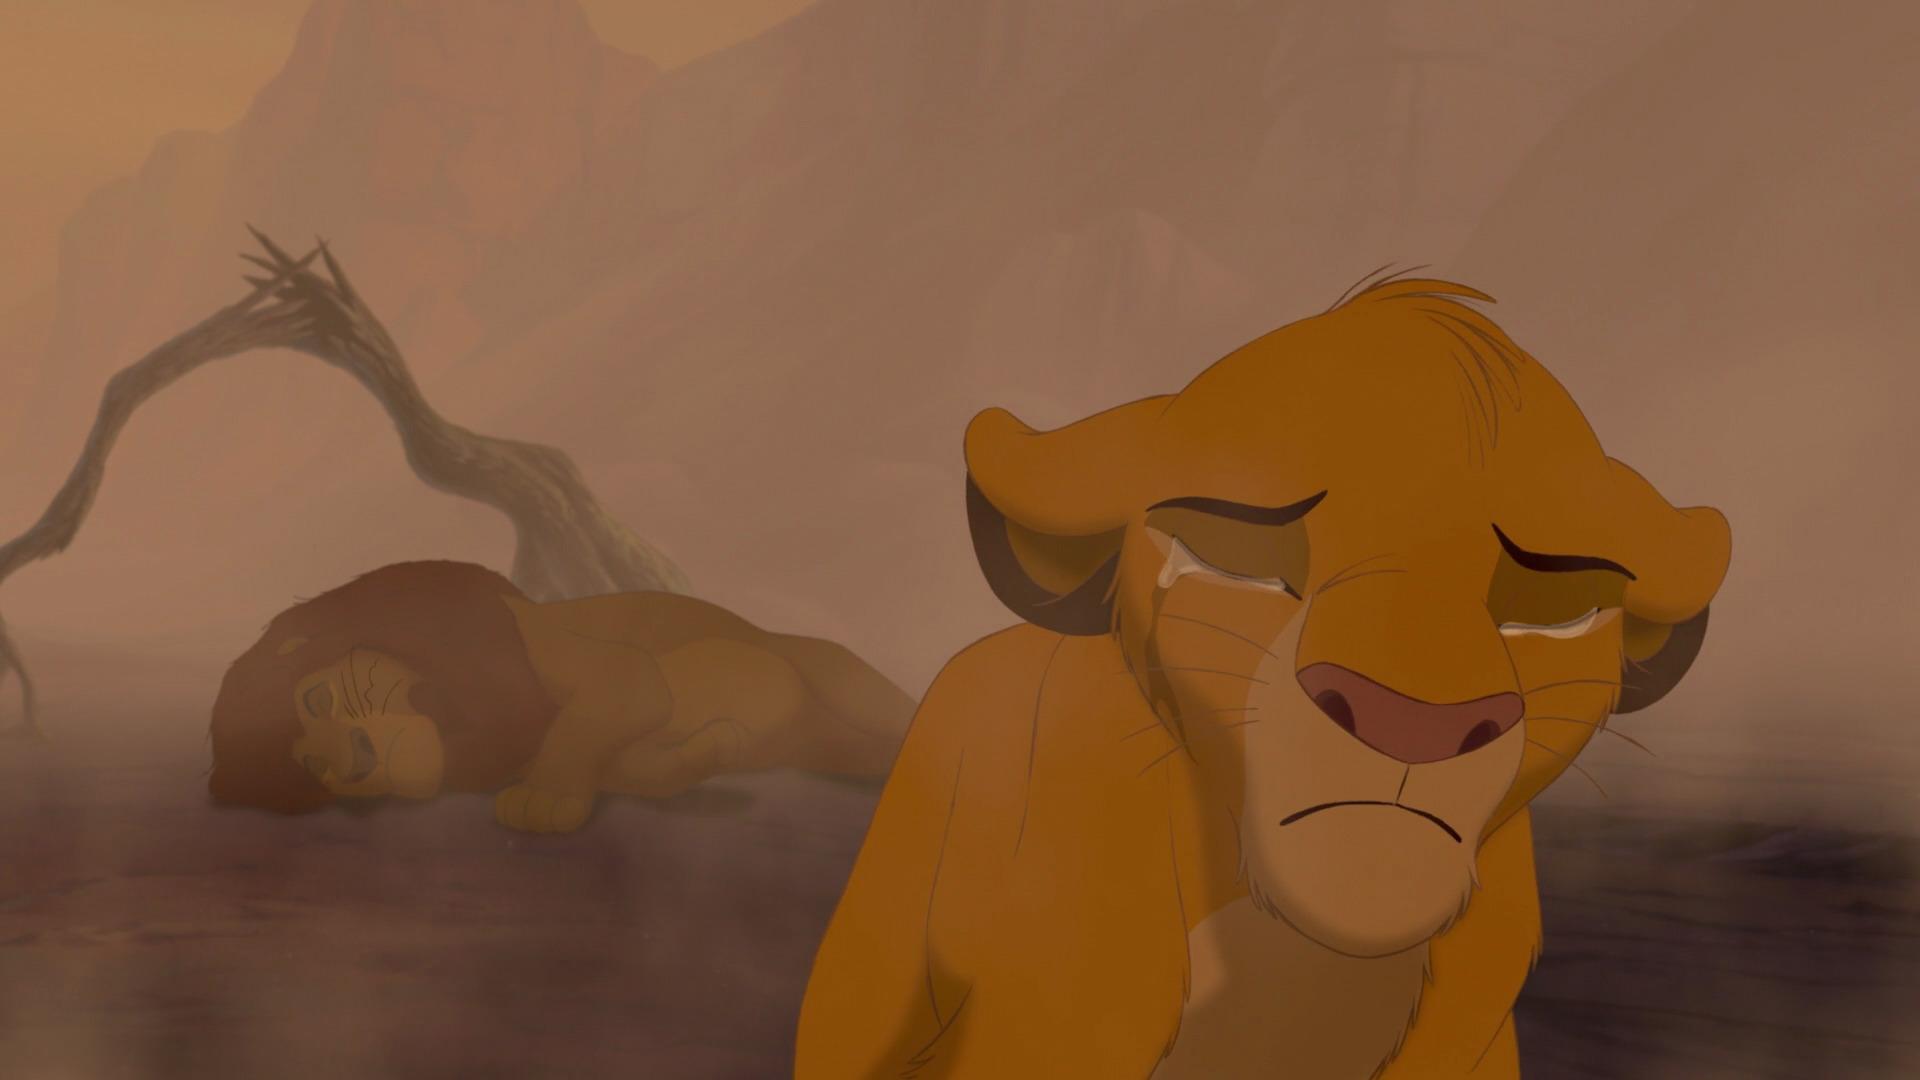 король лев картинки смерти муфасы